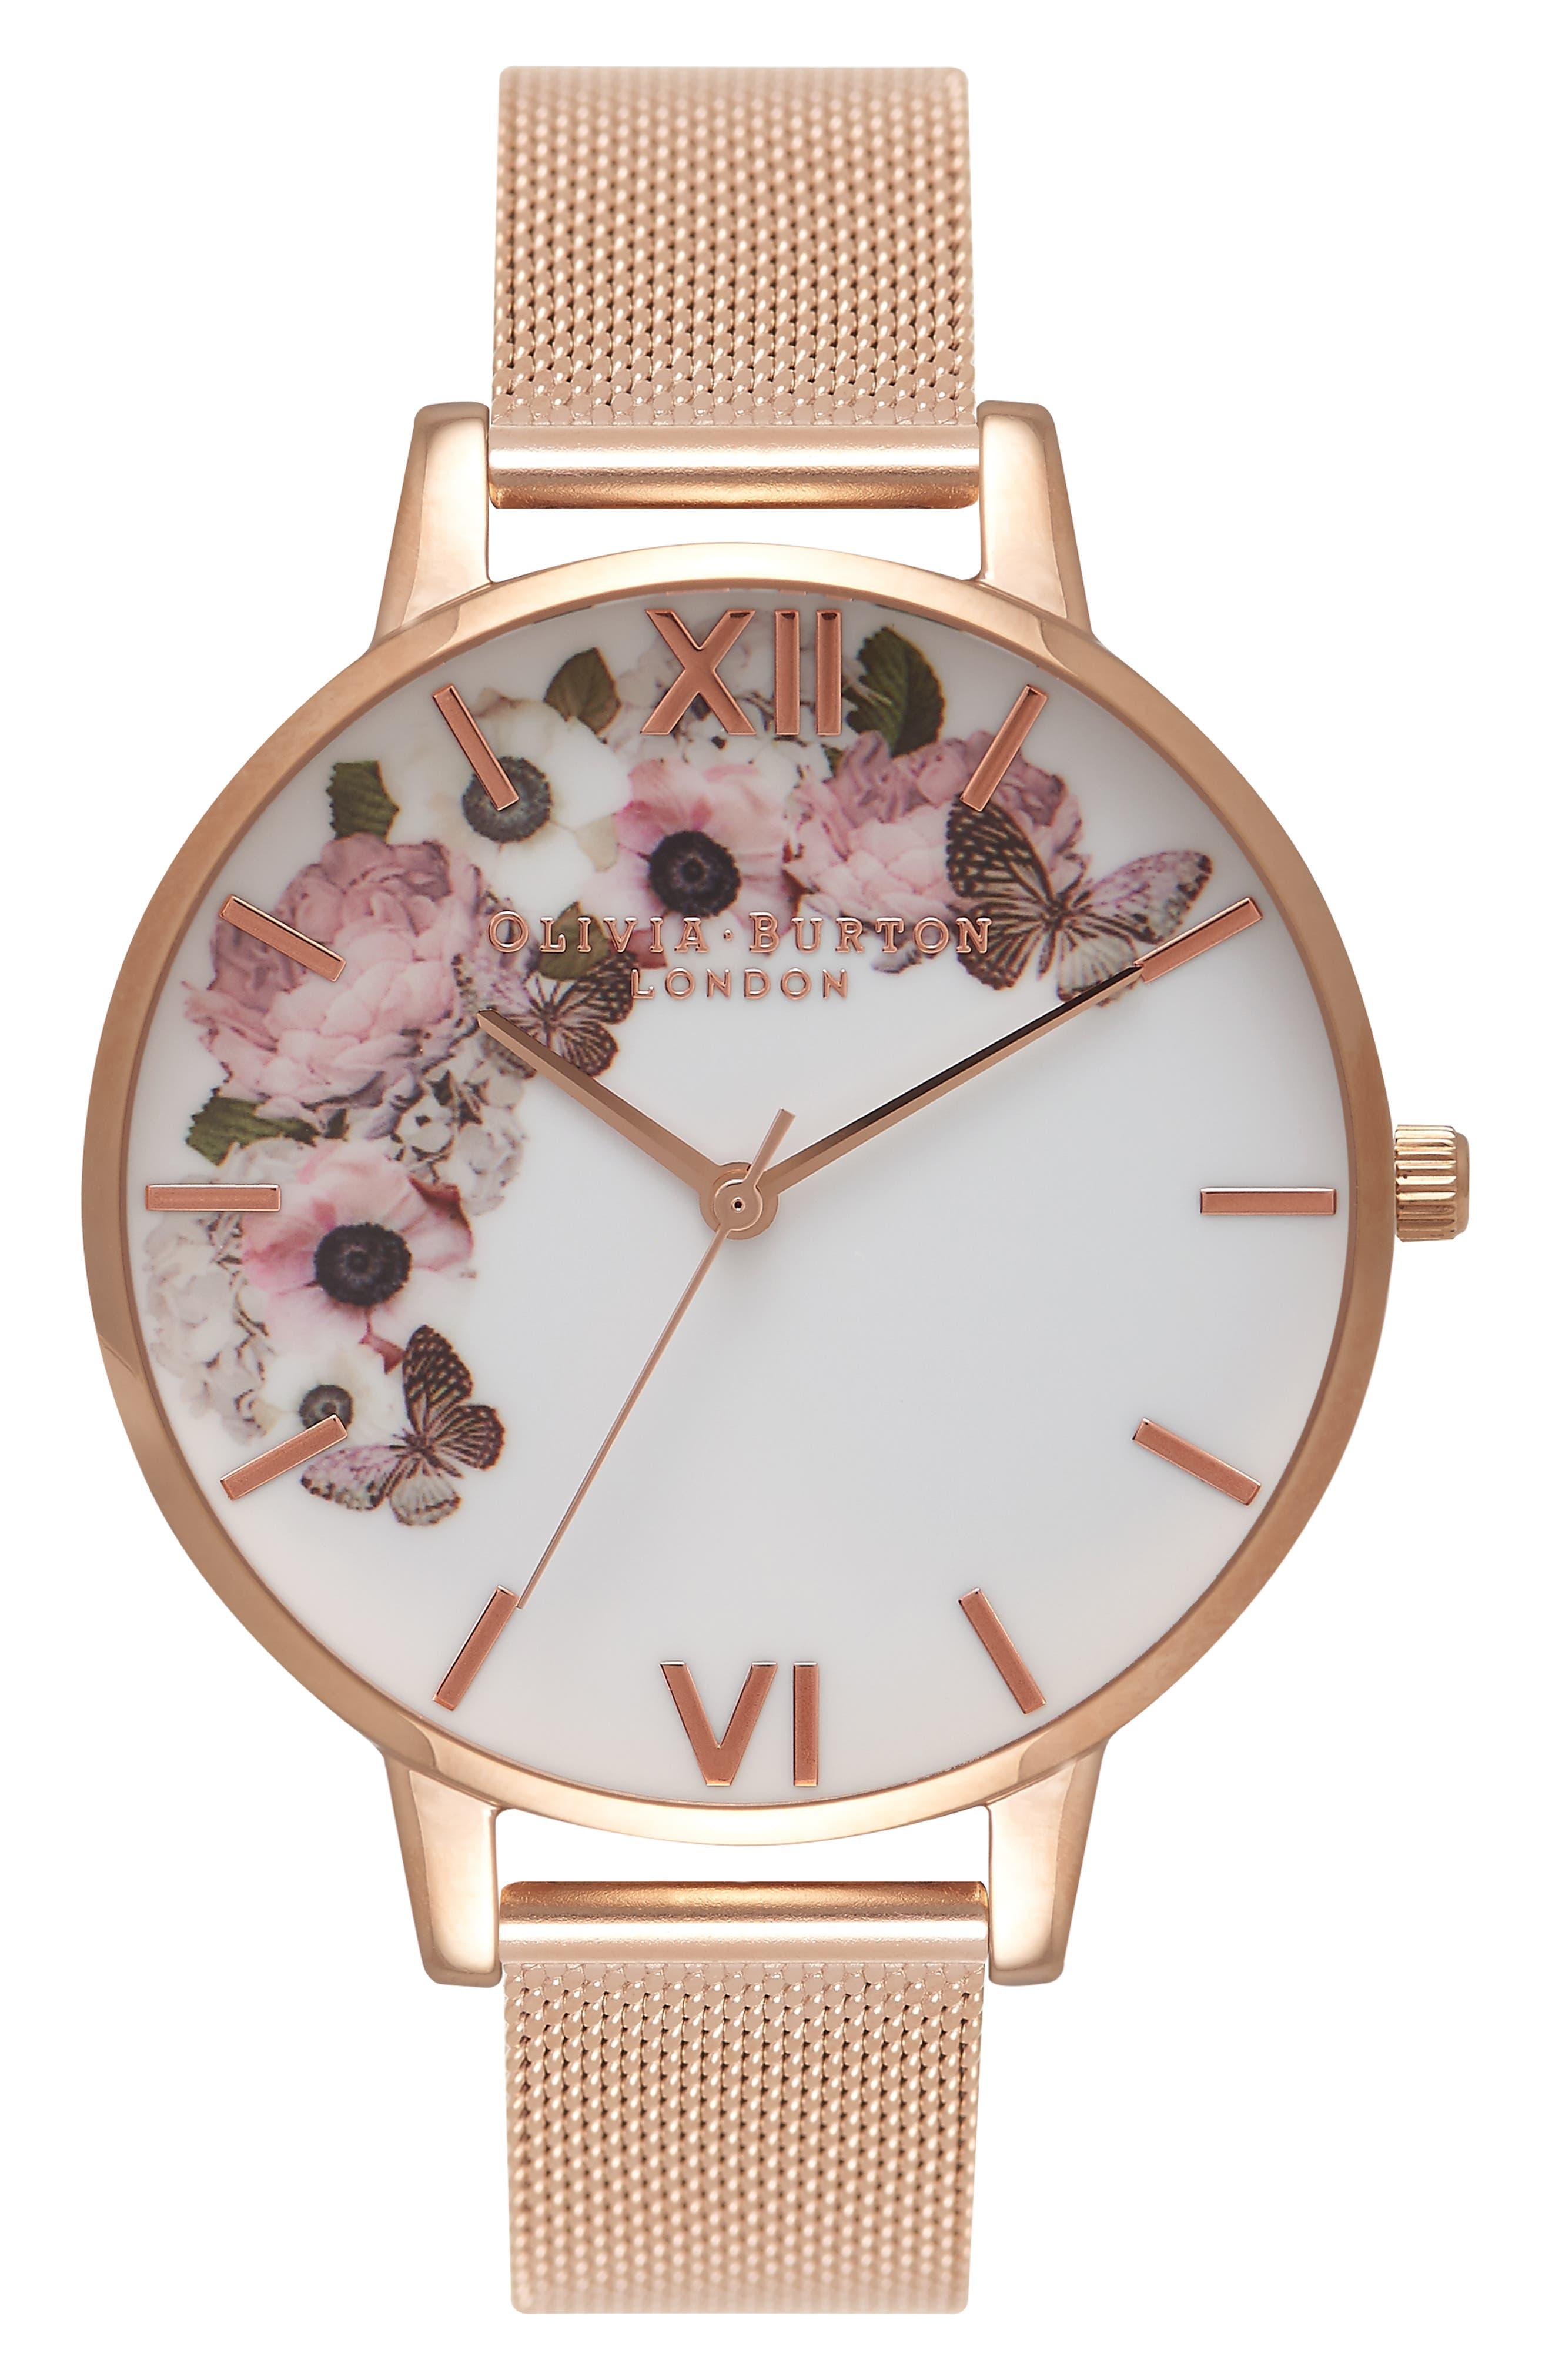 OLIVIA BURTON Signature Florals Mesh Bracelet Watch, 38mm, Main, color, ROSE GOLD/ ROSE GOLD/ WHITE